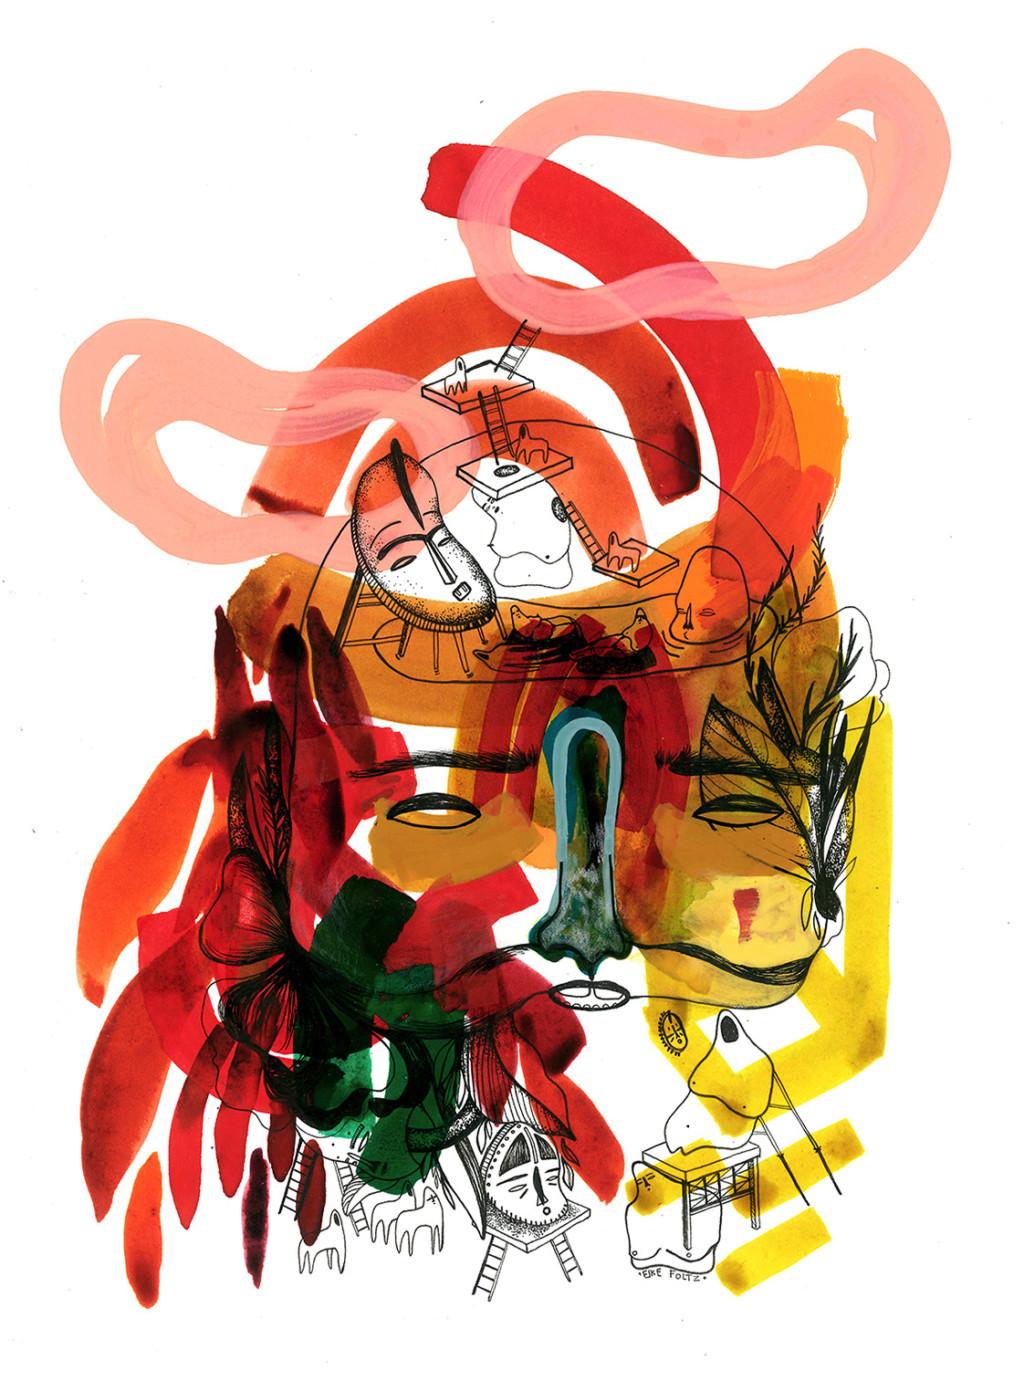 Elke Foltz / Illustration MAZES AND STATUARIES